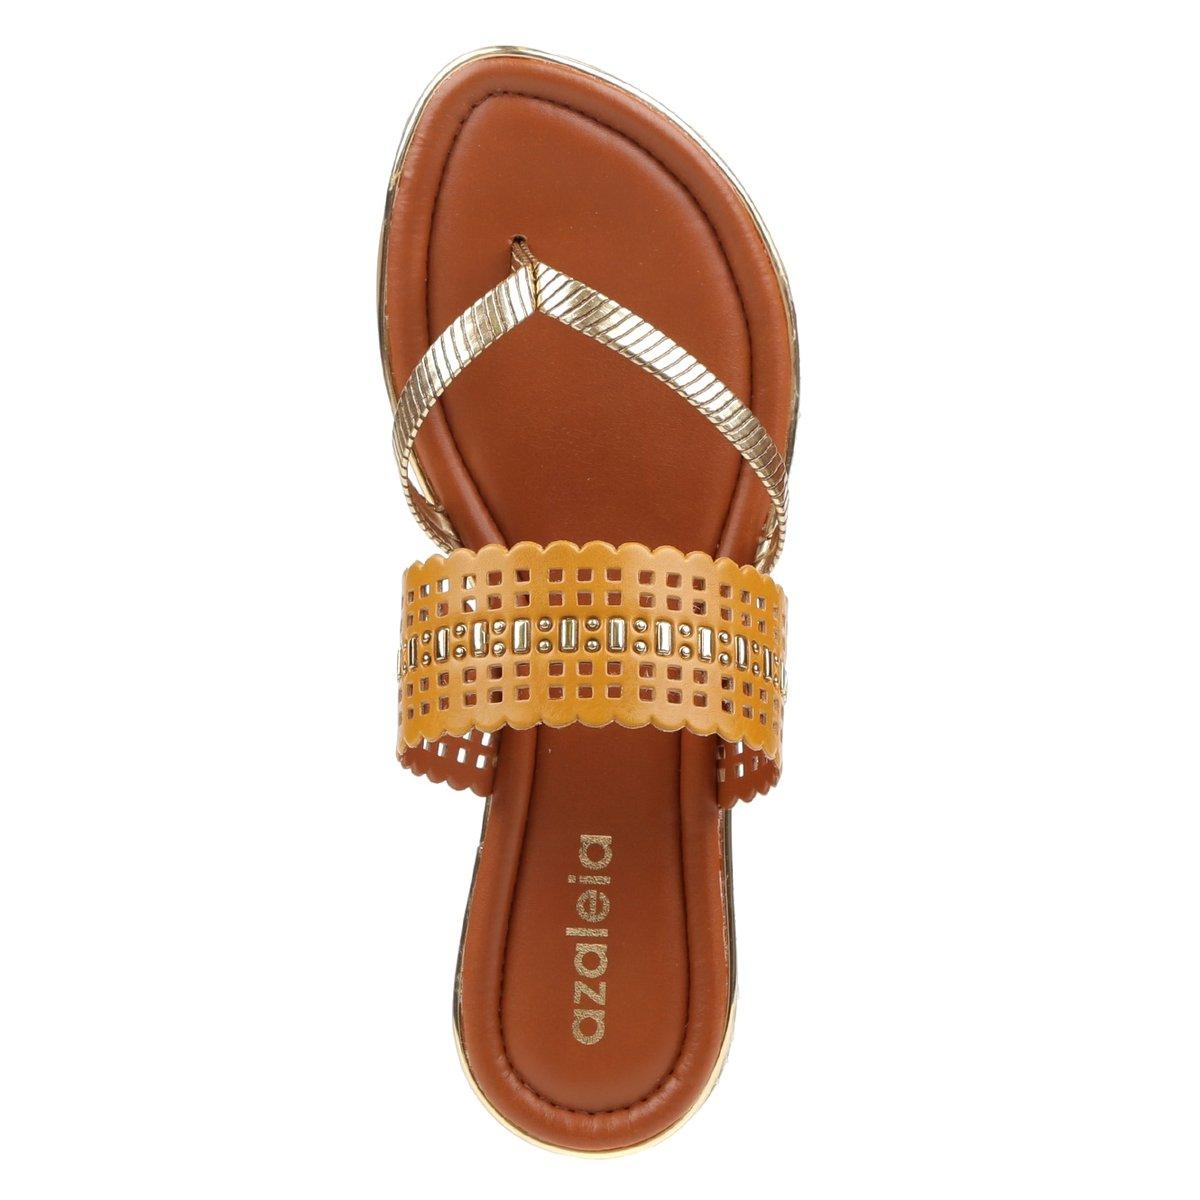 e5f2c42d30 Chinelo Feminino Azaléia Dourado - Compre Agora